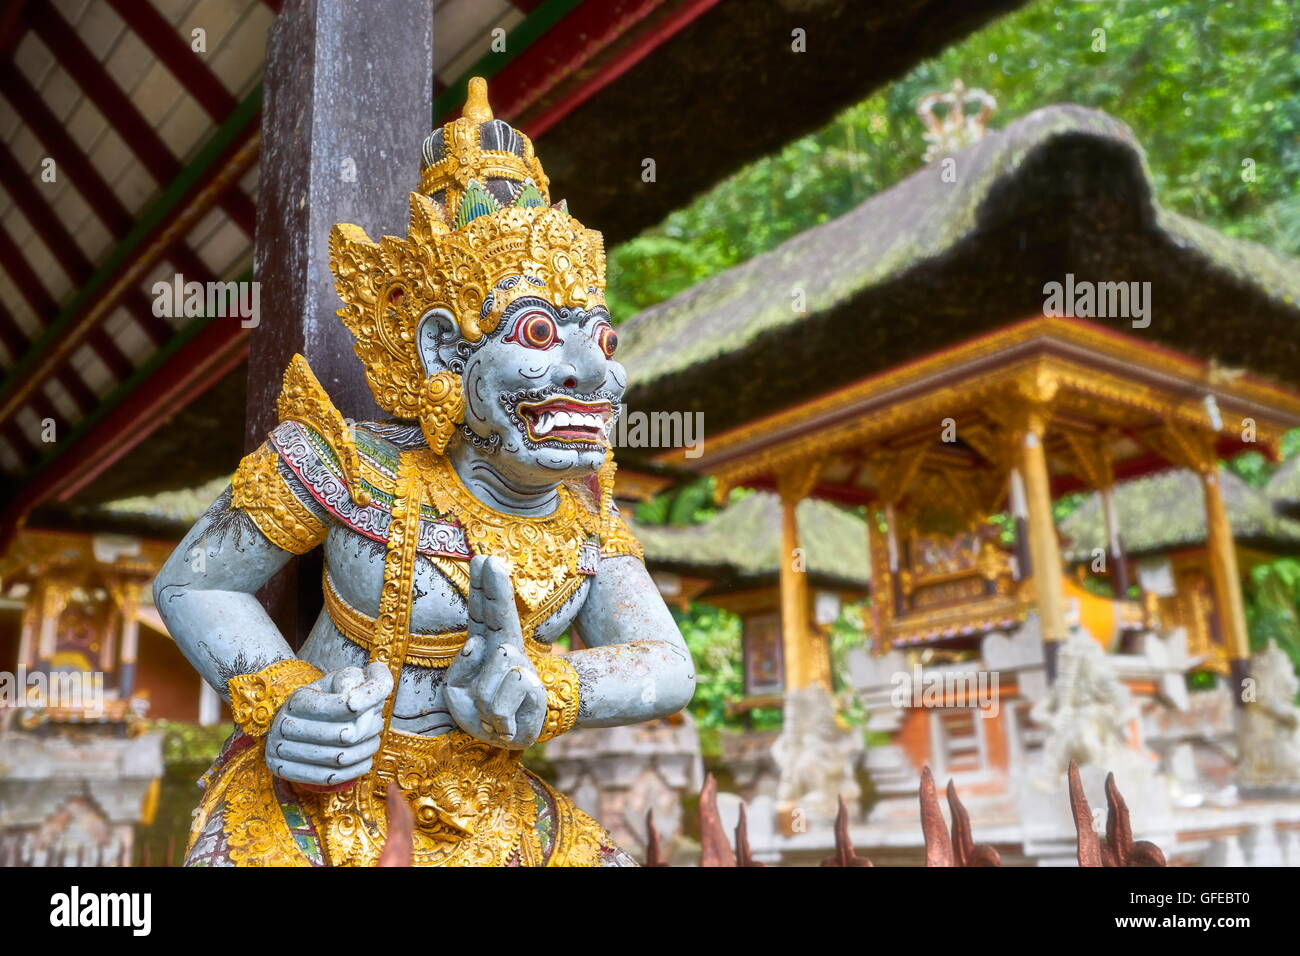 Gott Statue in Pura Gunung Kawi Tempel, Bali, Indonesien Stockbild